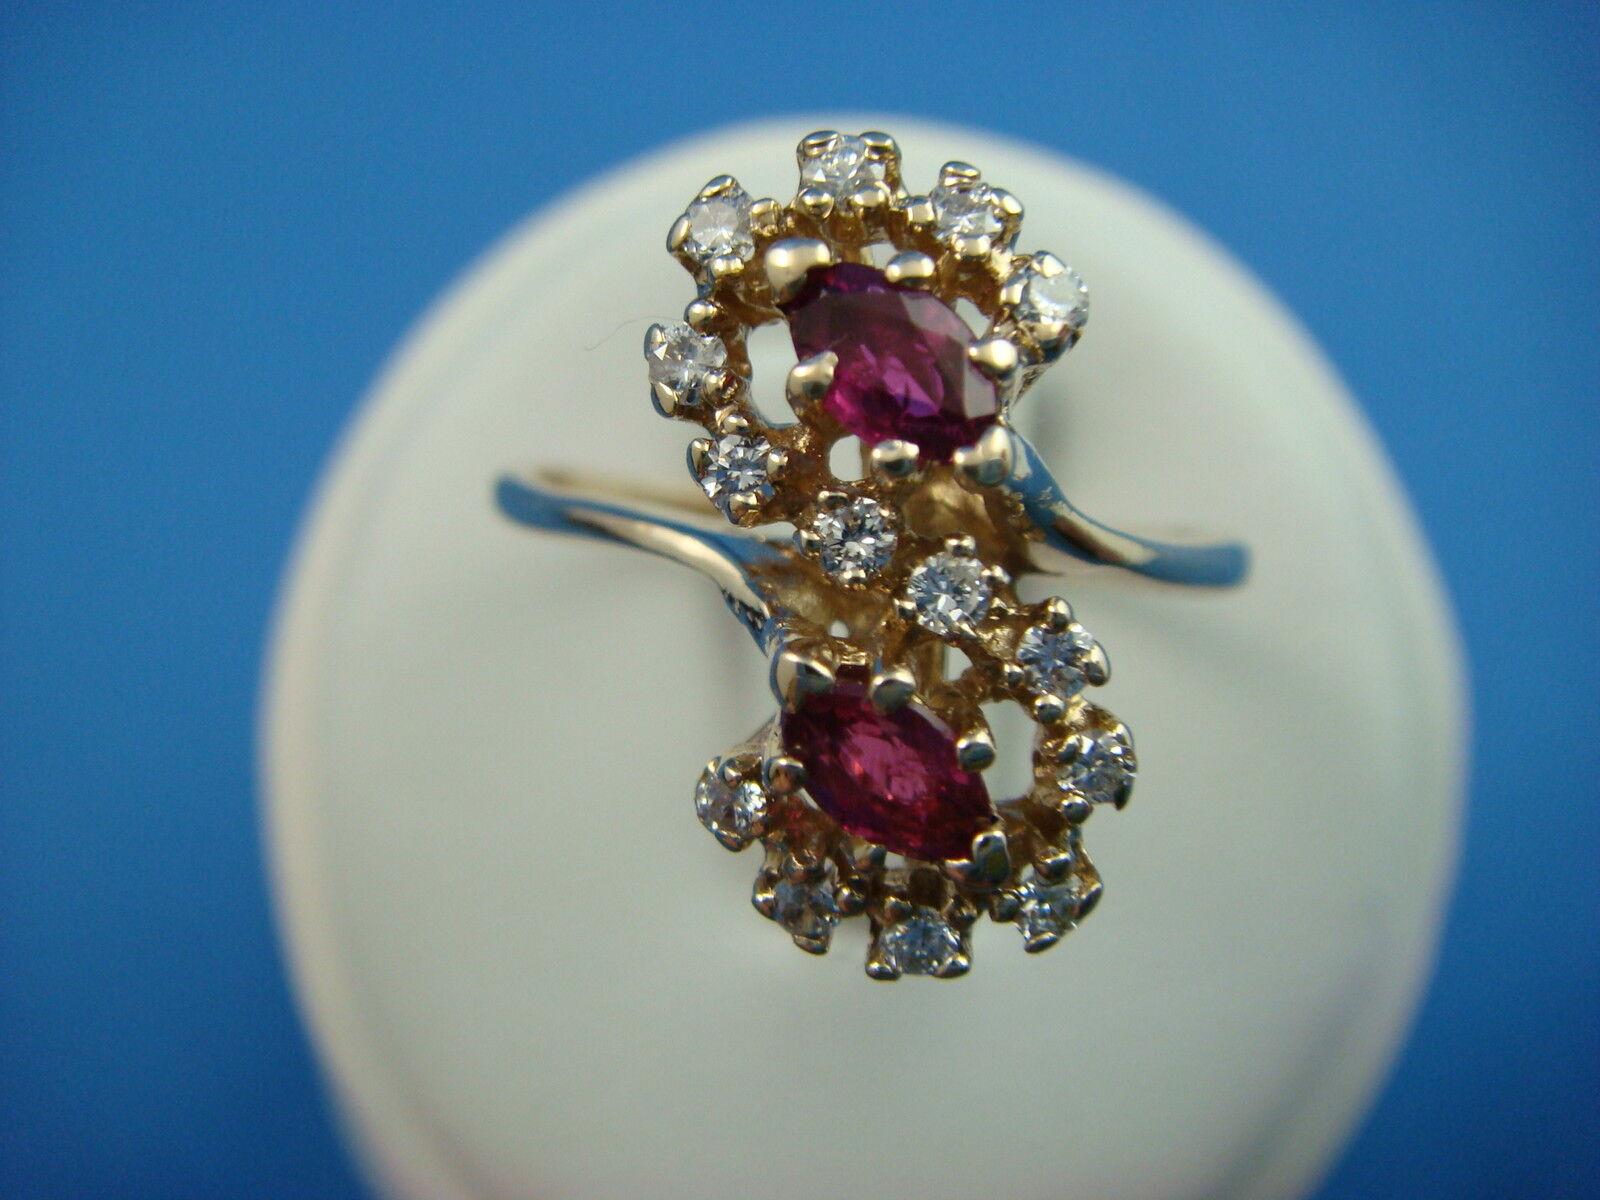 14K YELLOW gold, GENUINE RUBIES & DIAMONDS VINTAGE LADIES RING 3.4 GRAMS SIZE 8